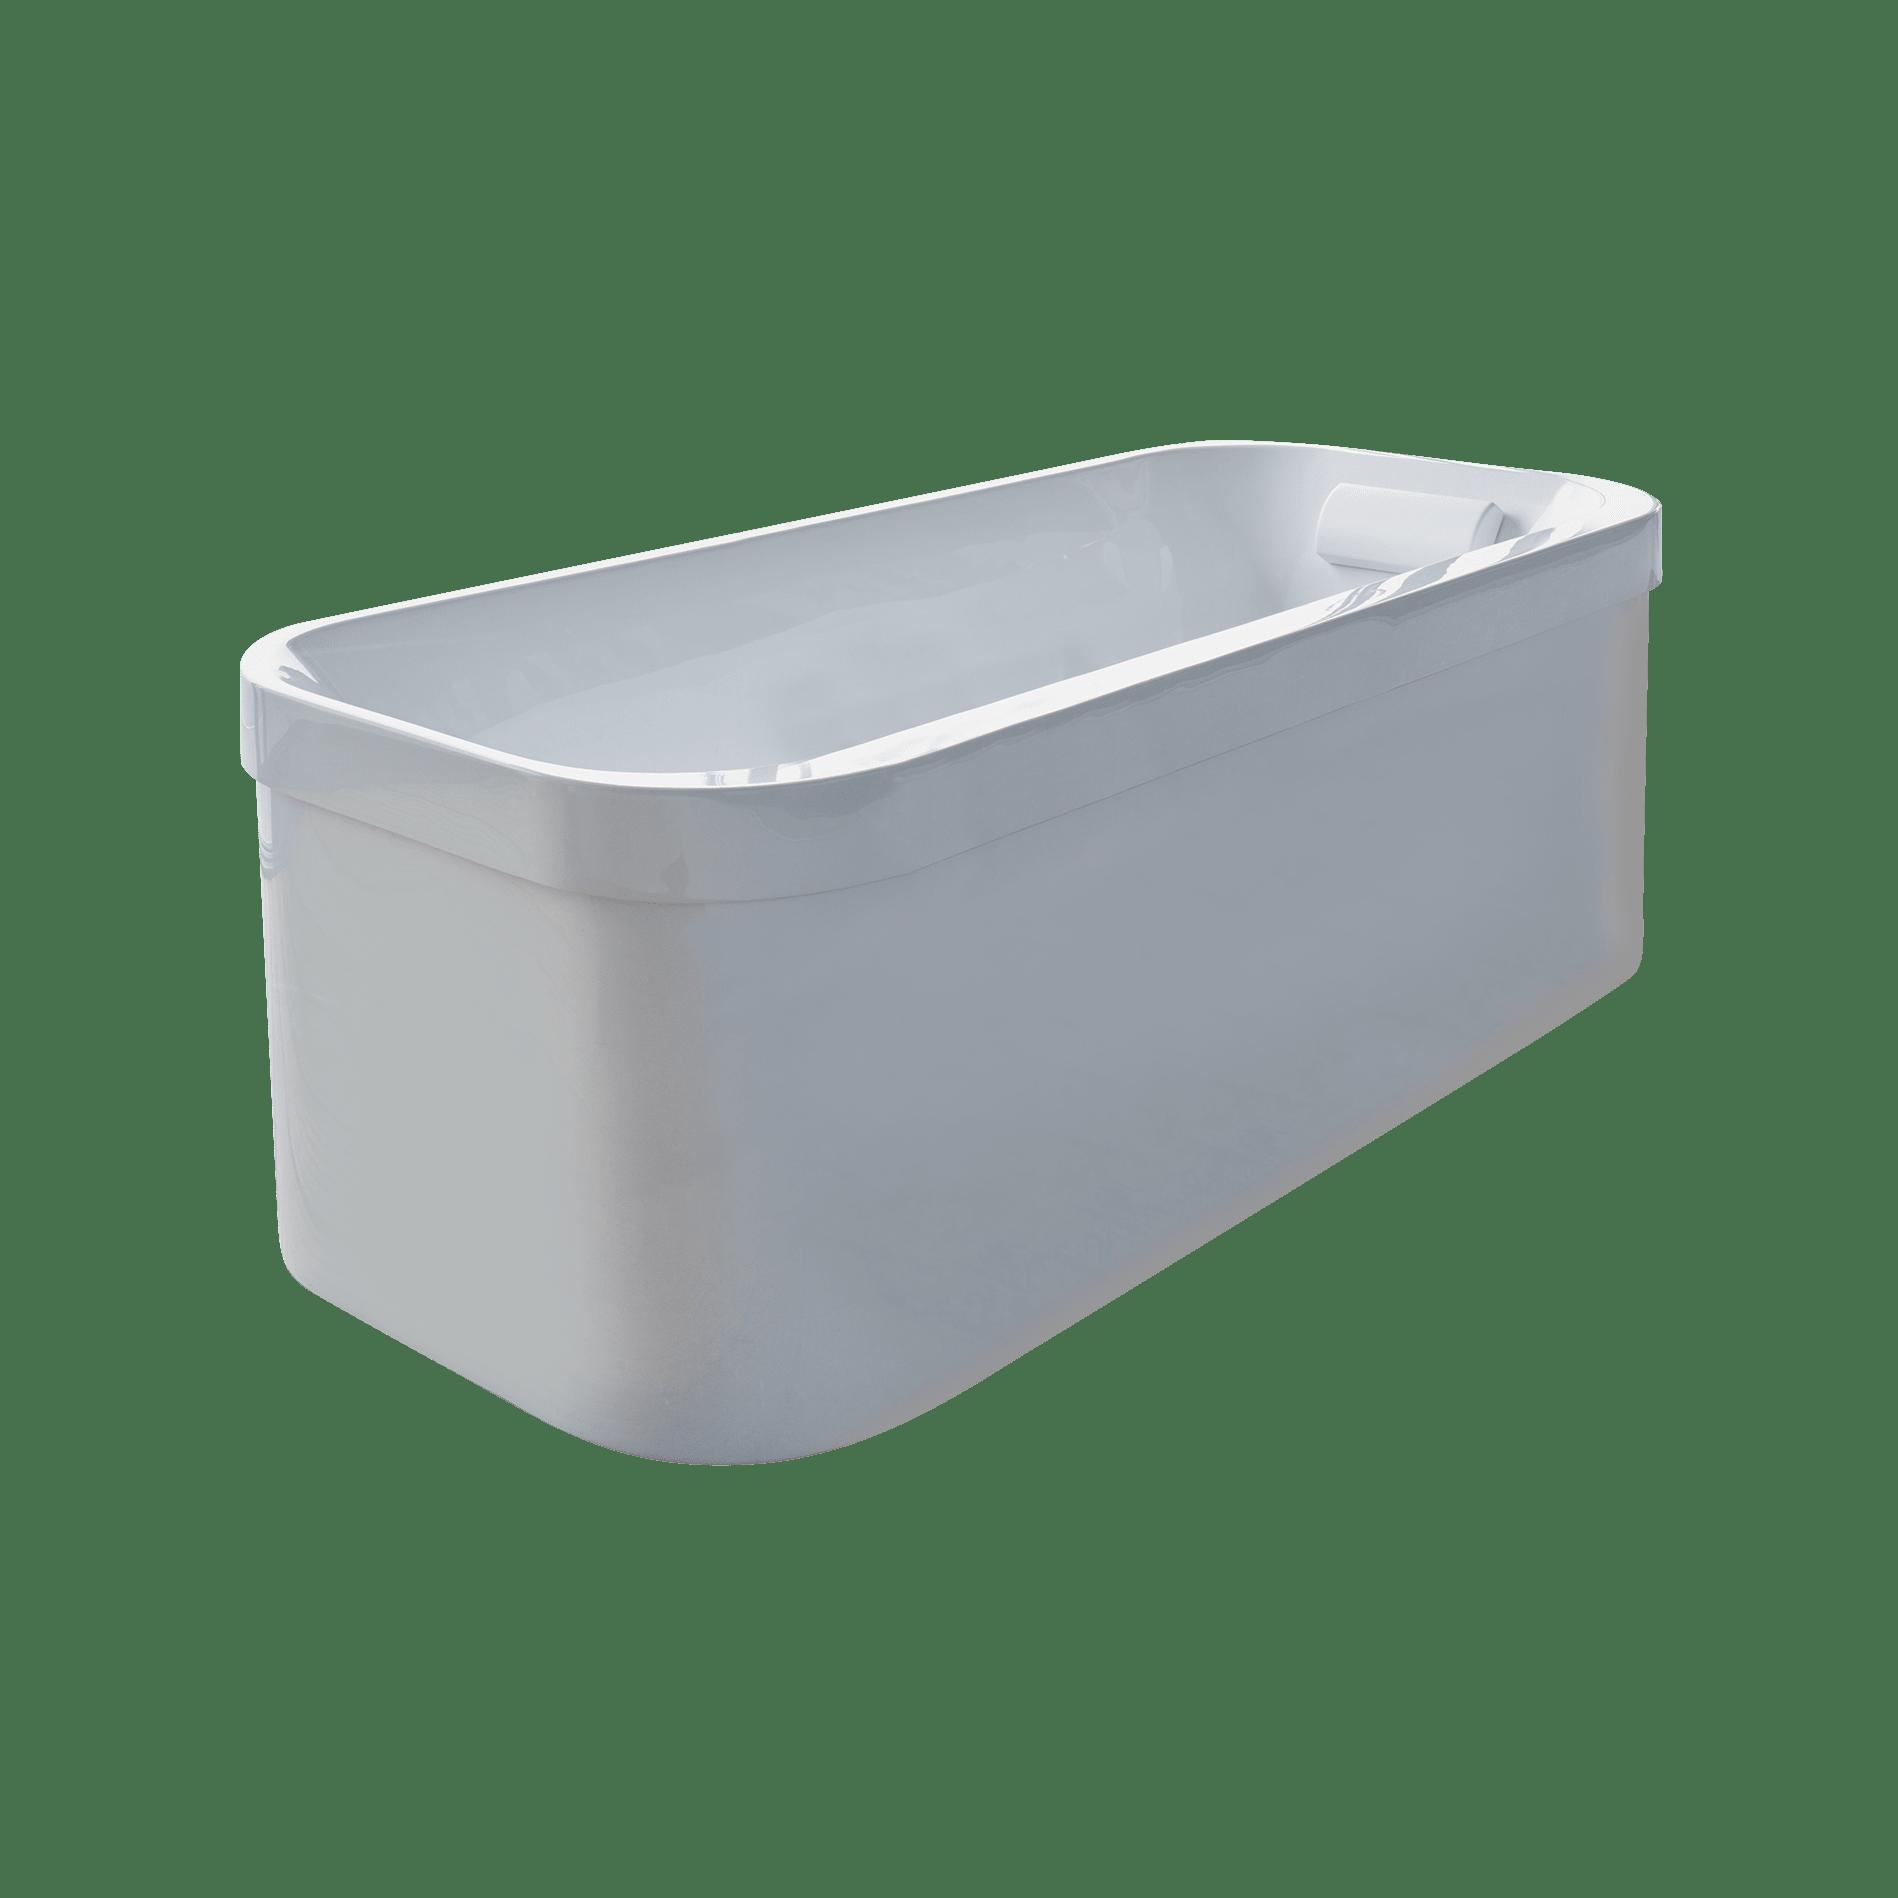 Duravit 700319000000090 Happy D.2 Freestanding Soaker Tub ...